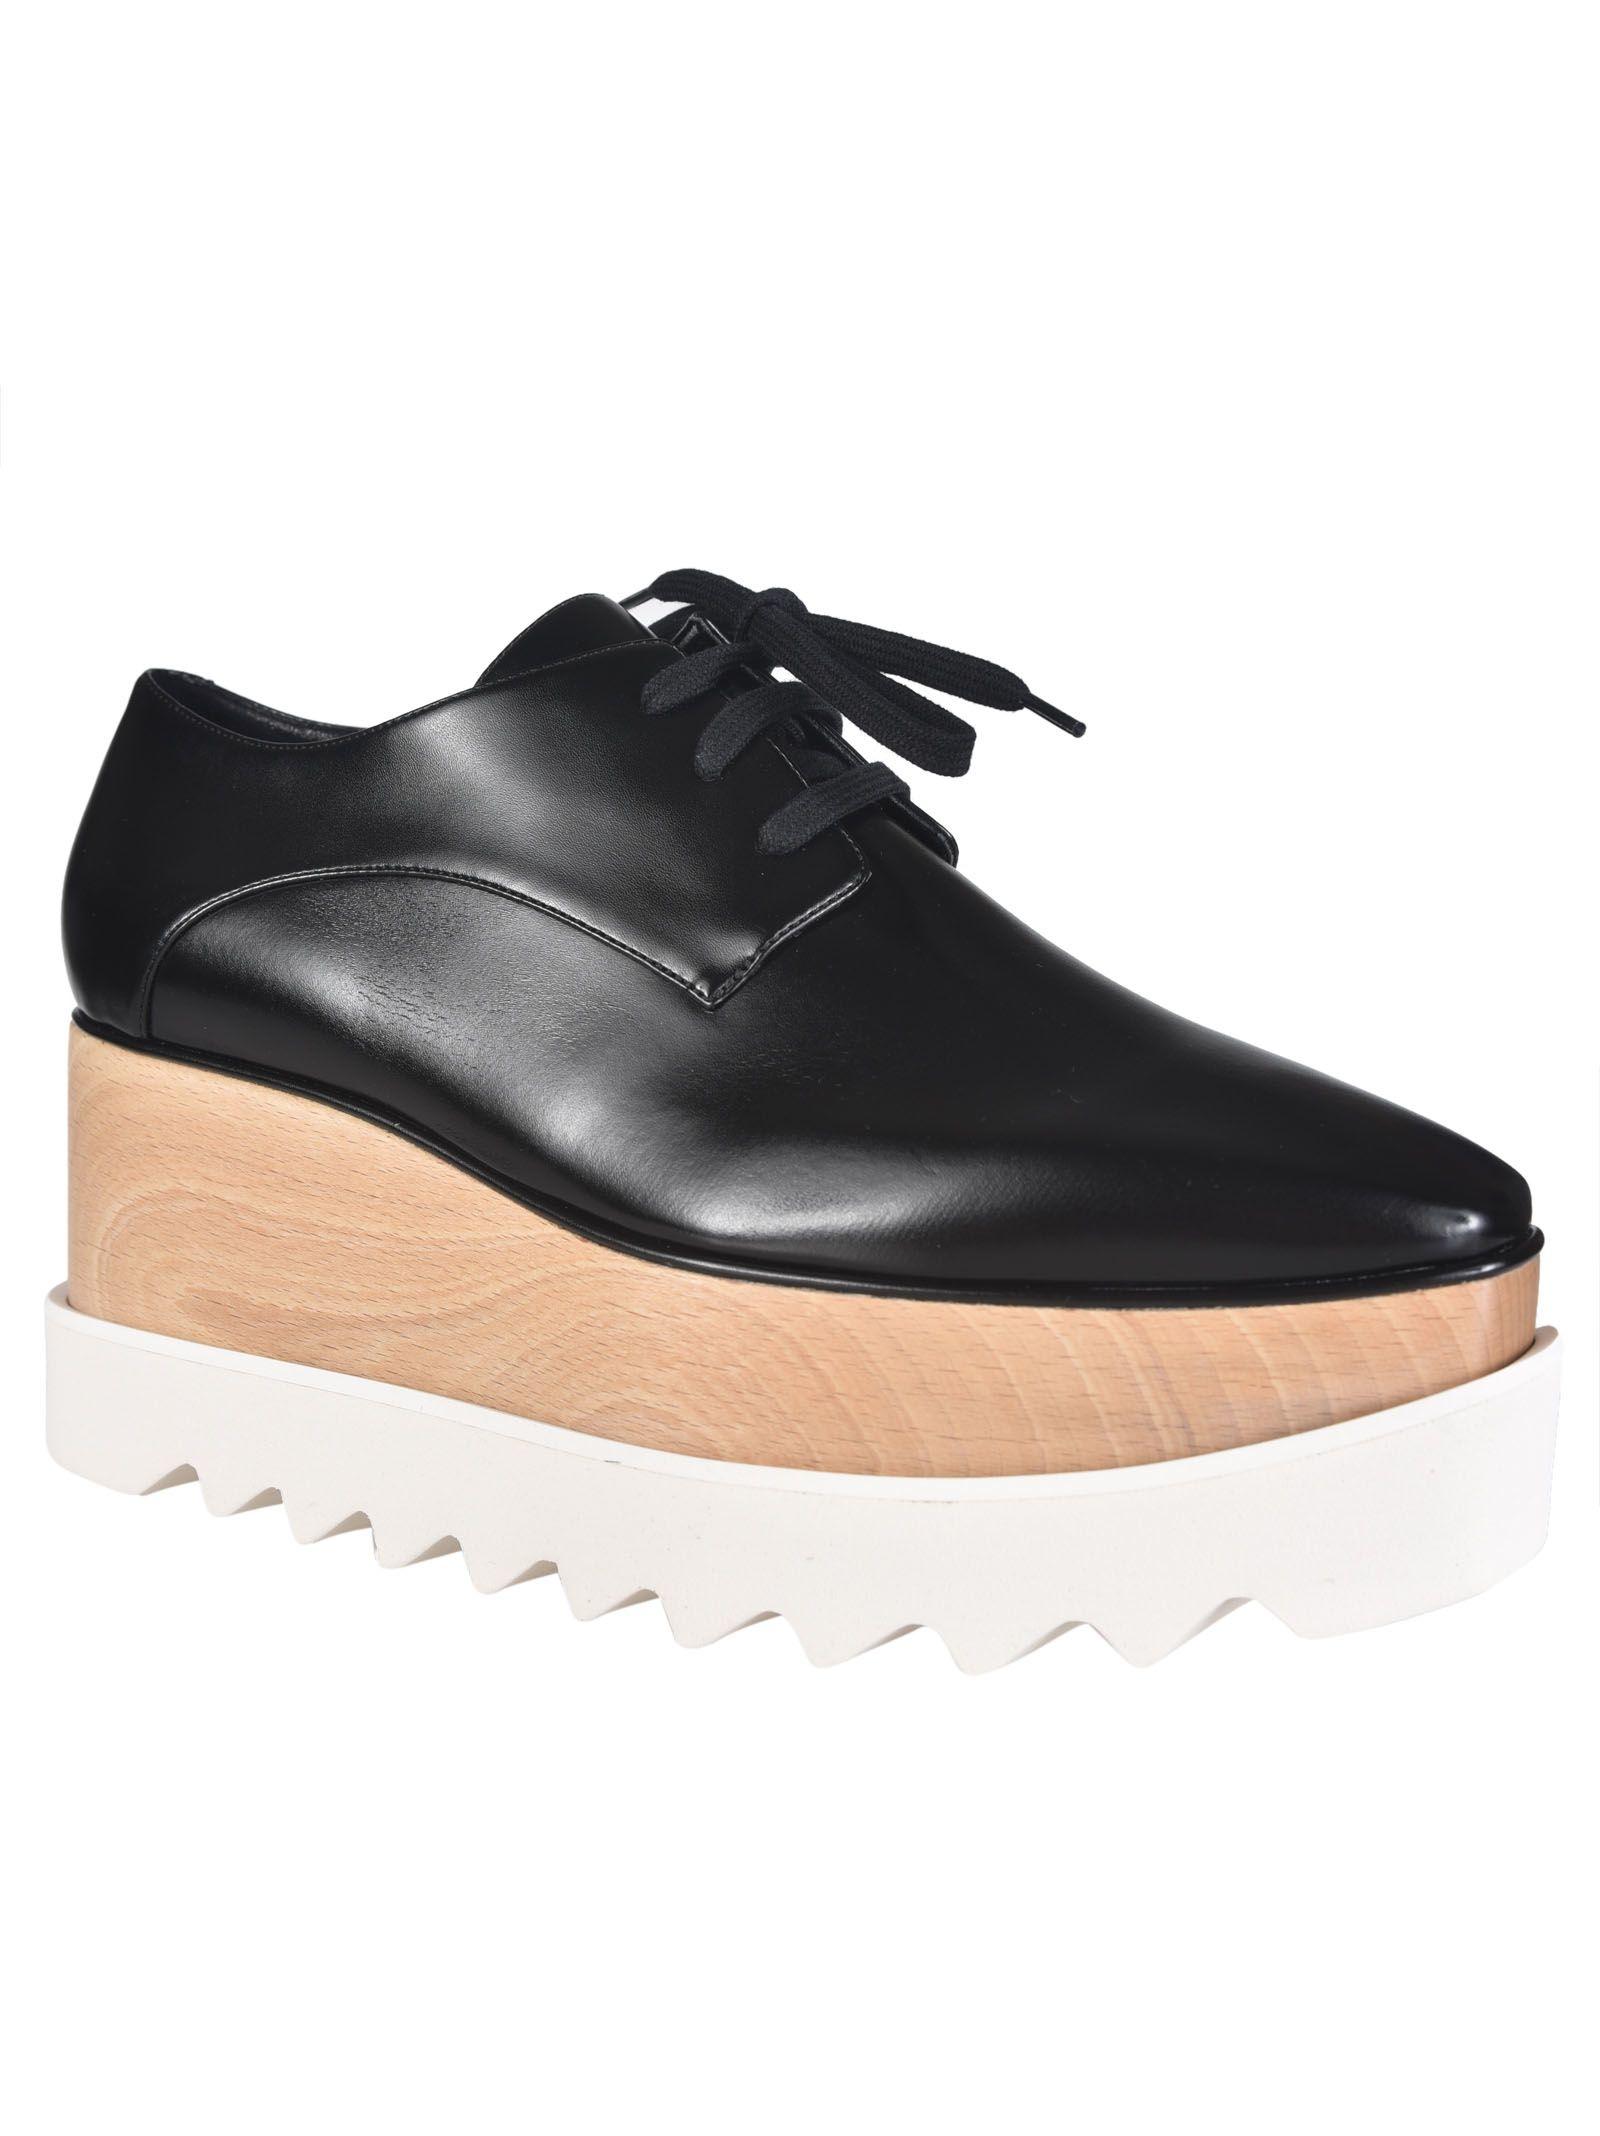 Stella Mccartney Elyse Shoes Sale